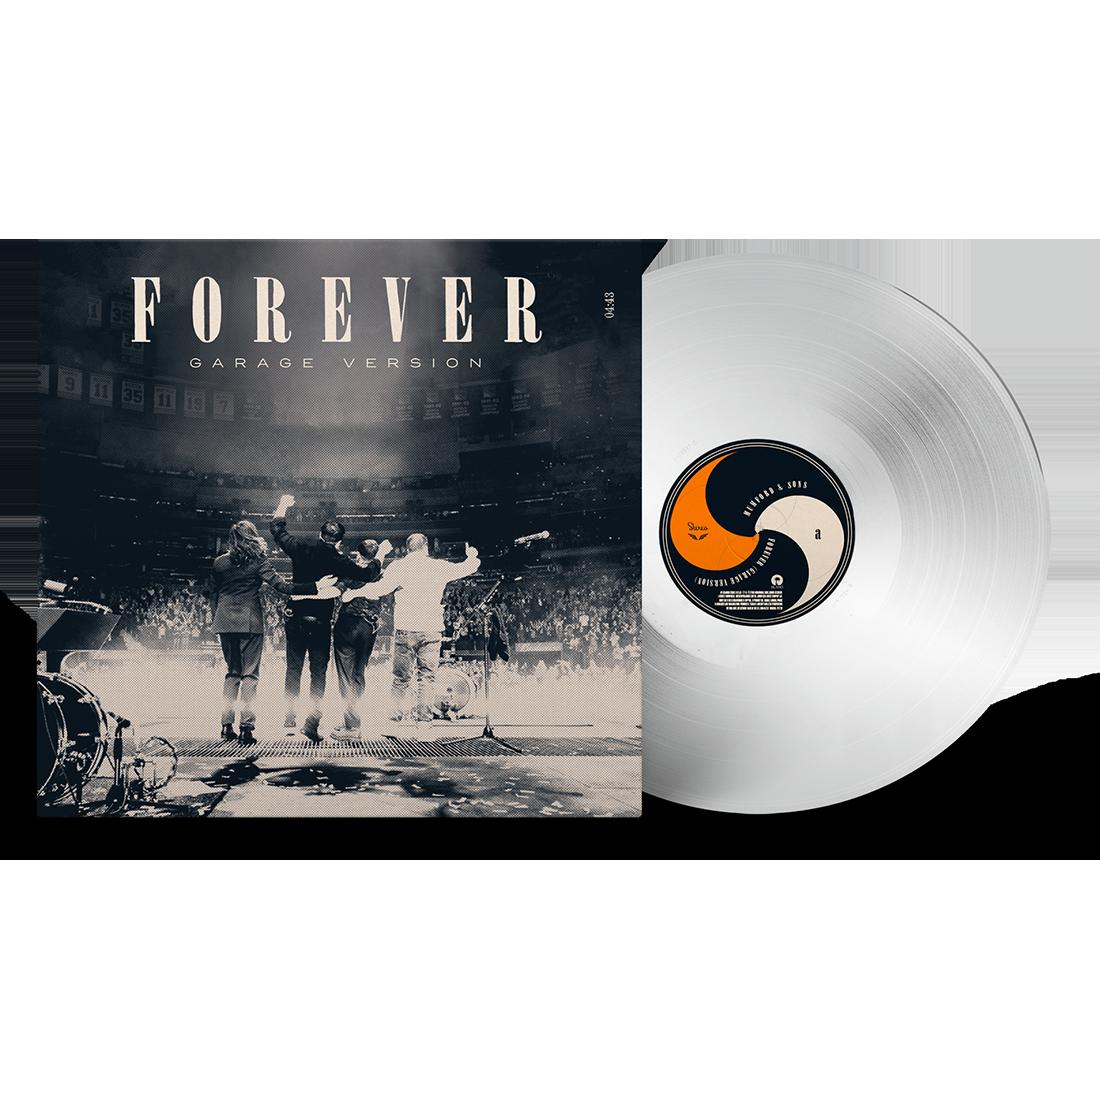 Mumford & Sons – Forever (Garage Version) White Vinyl